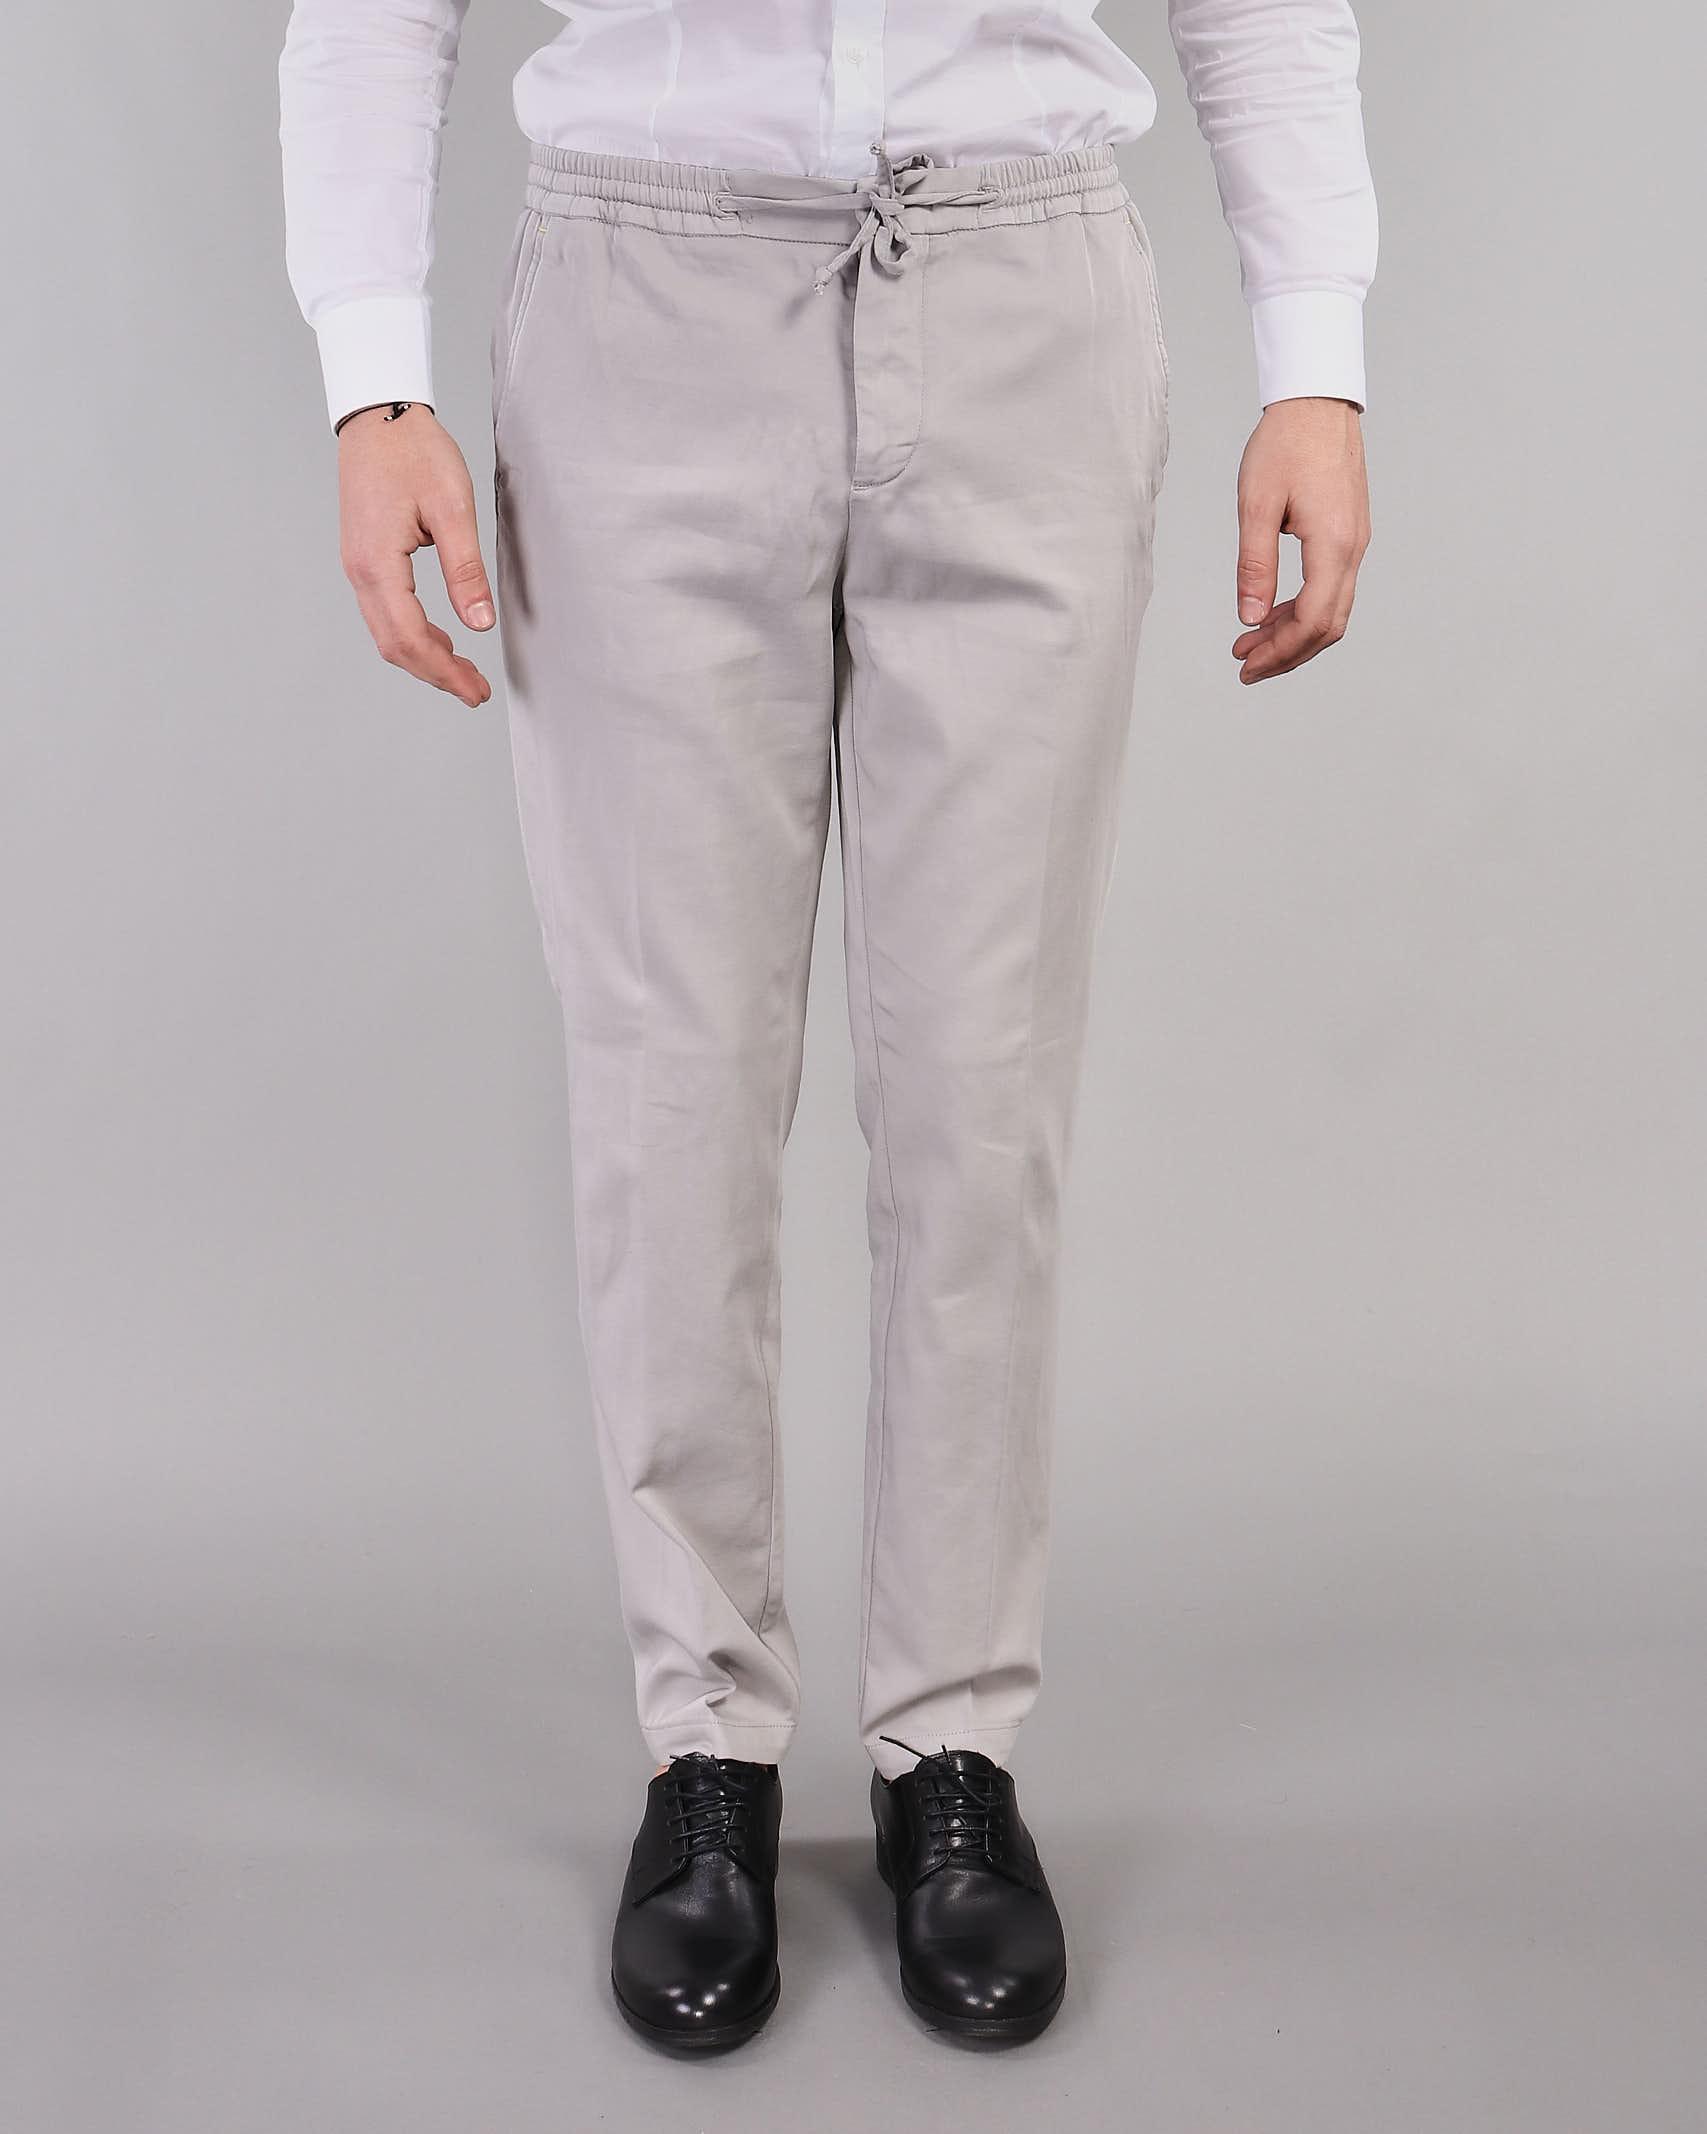 Pantalone con elastico in vita Manuel Ritz MANUEL RITZ   Pantalone   3032P1688T21300693